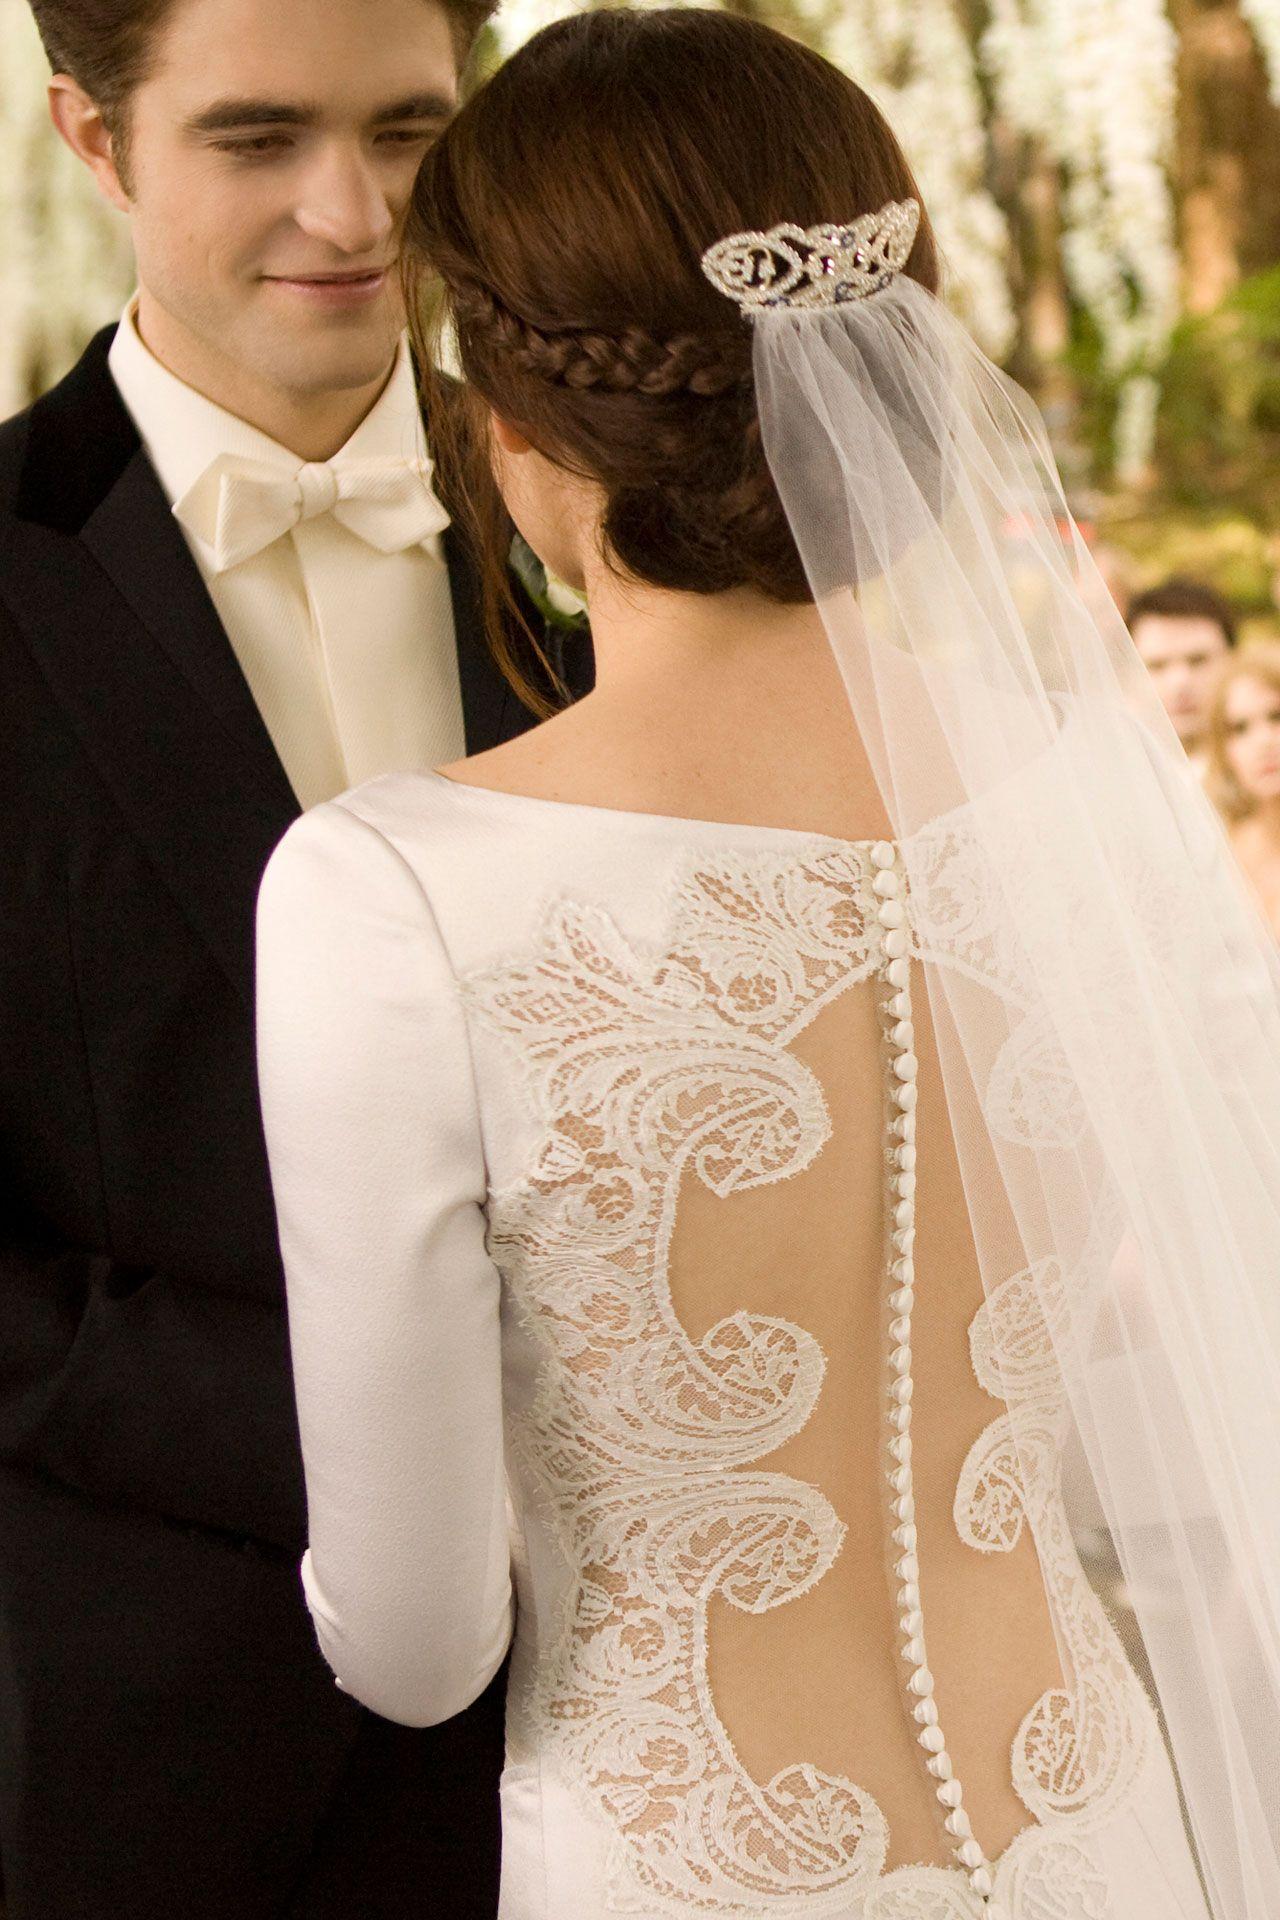 Bella's wedding dress in breaking dawn  Another new HQ Breaking Dawn wedding still  fashion  Pinterest